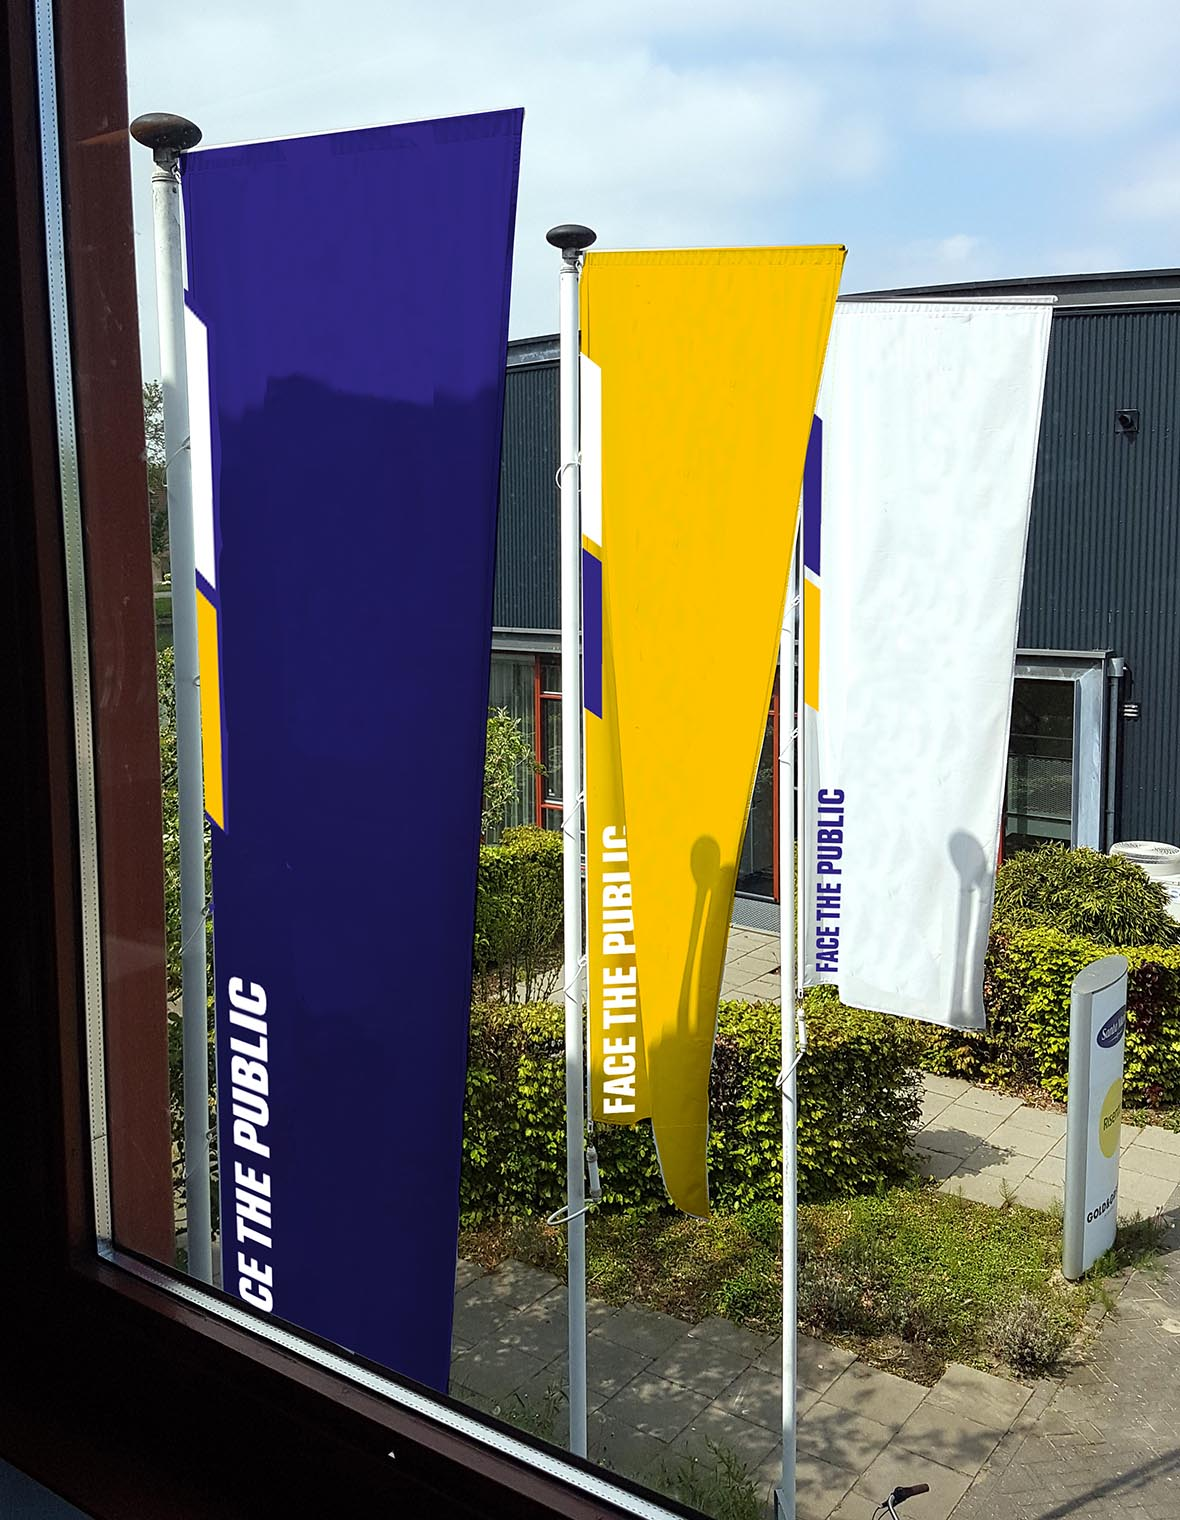 facethepublic grafisch ontwerp interieur huisstijl vlaggen mastvlaggen